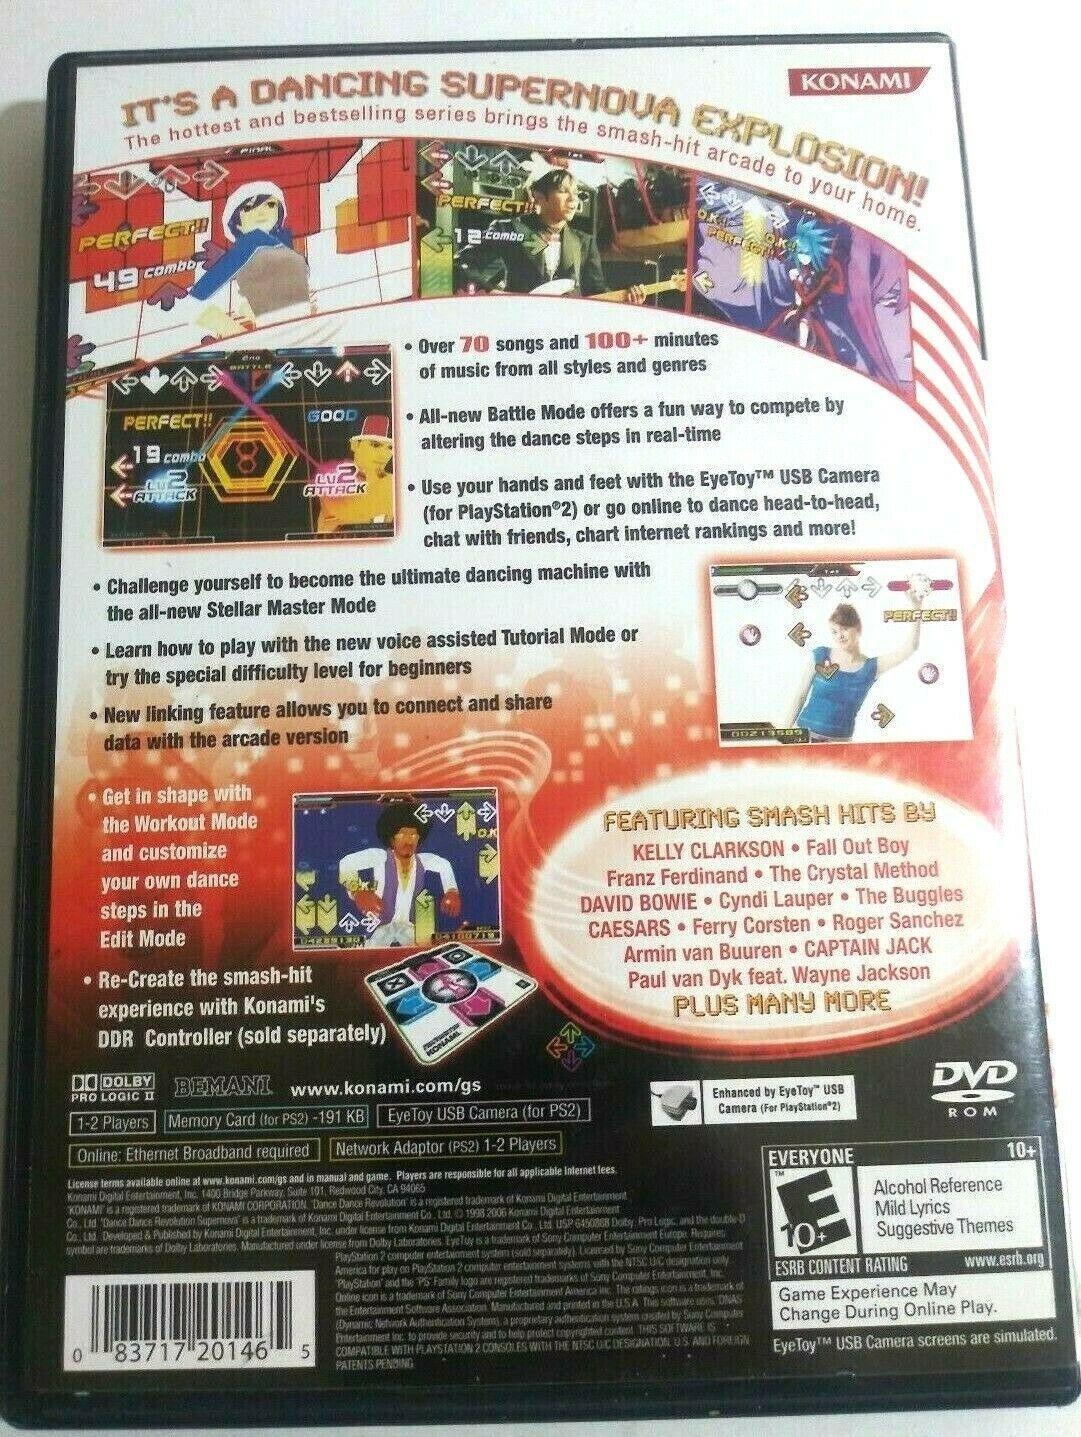 Dance Dance Revolution Super Nova Sony PlayStation 2, 2006 image 2